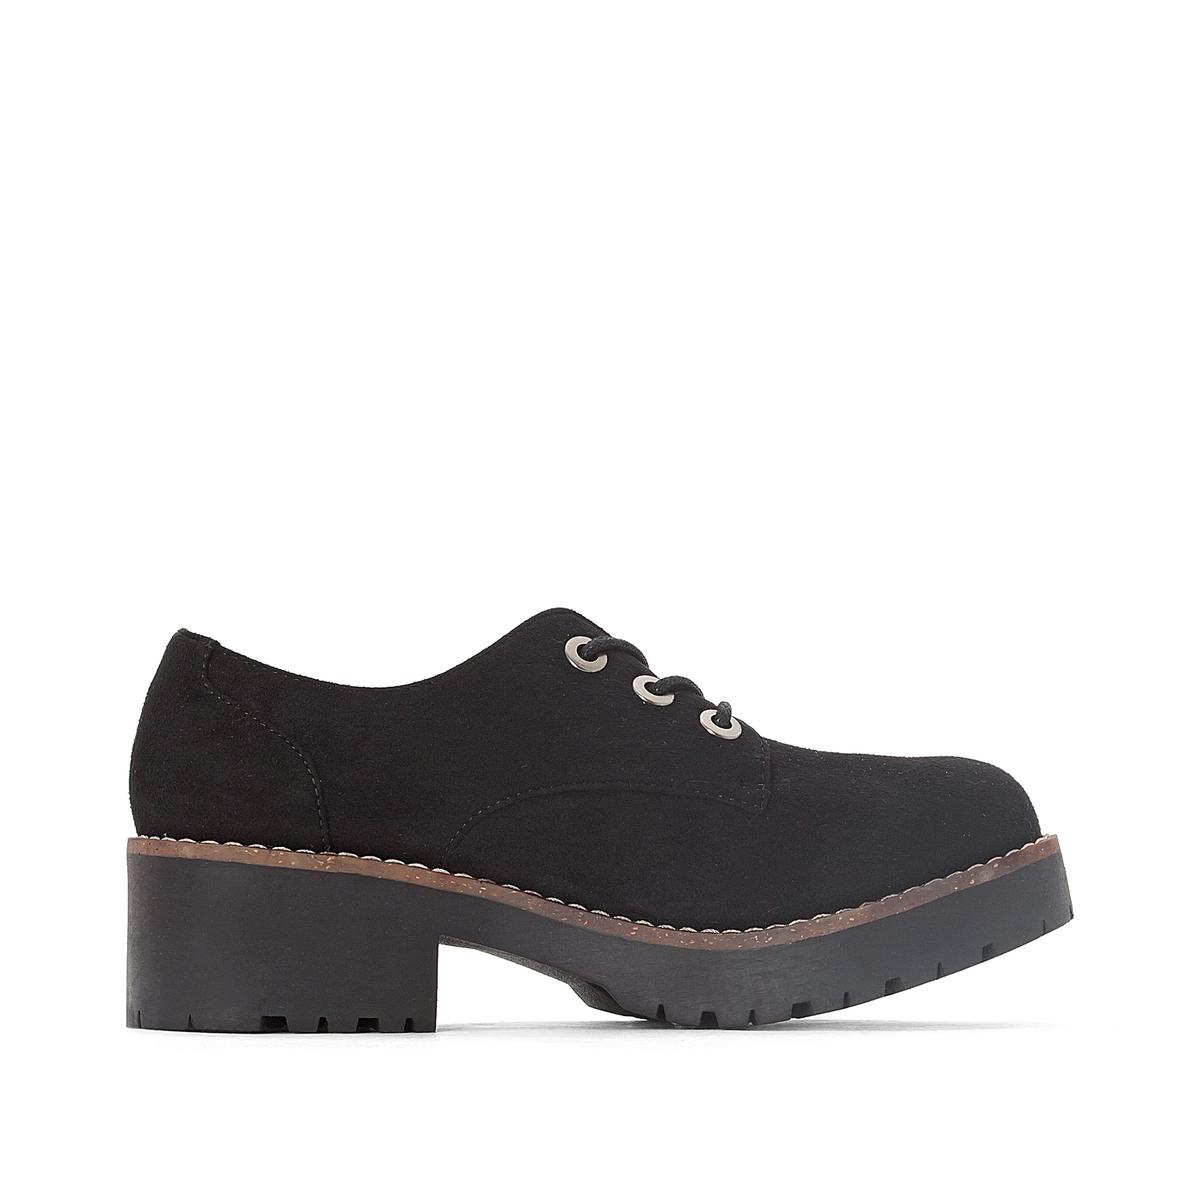 Ботинки-дерби на каблуке  Cherblu цены онлайн